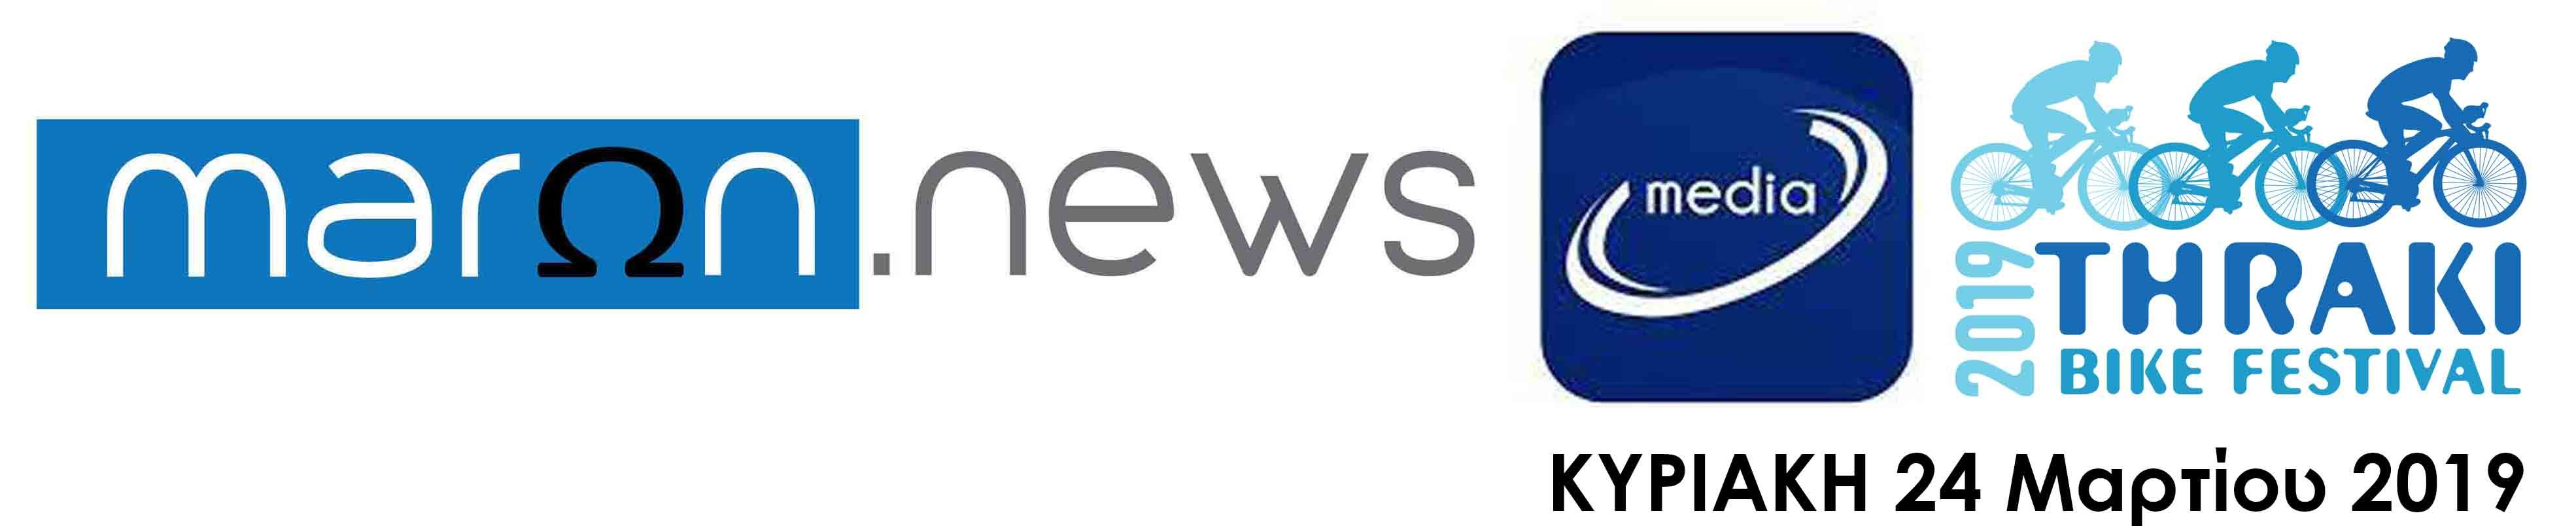 MaronNews